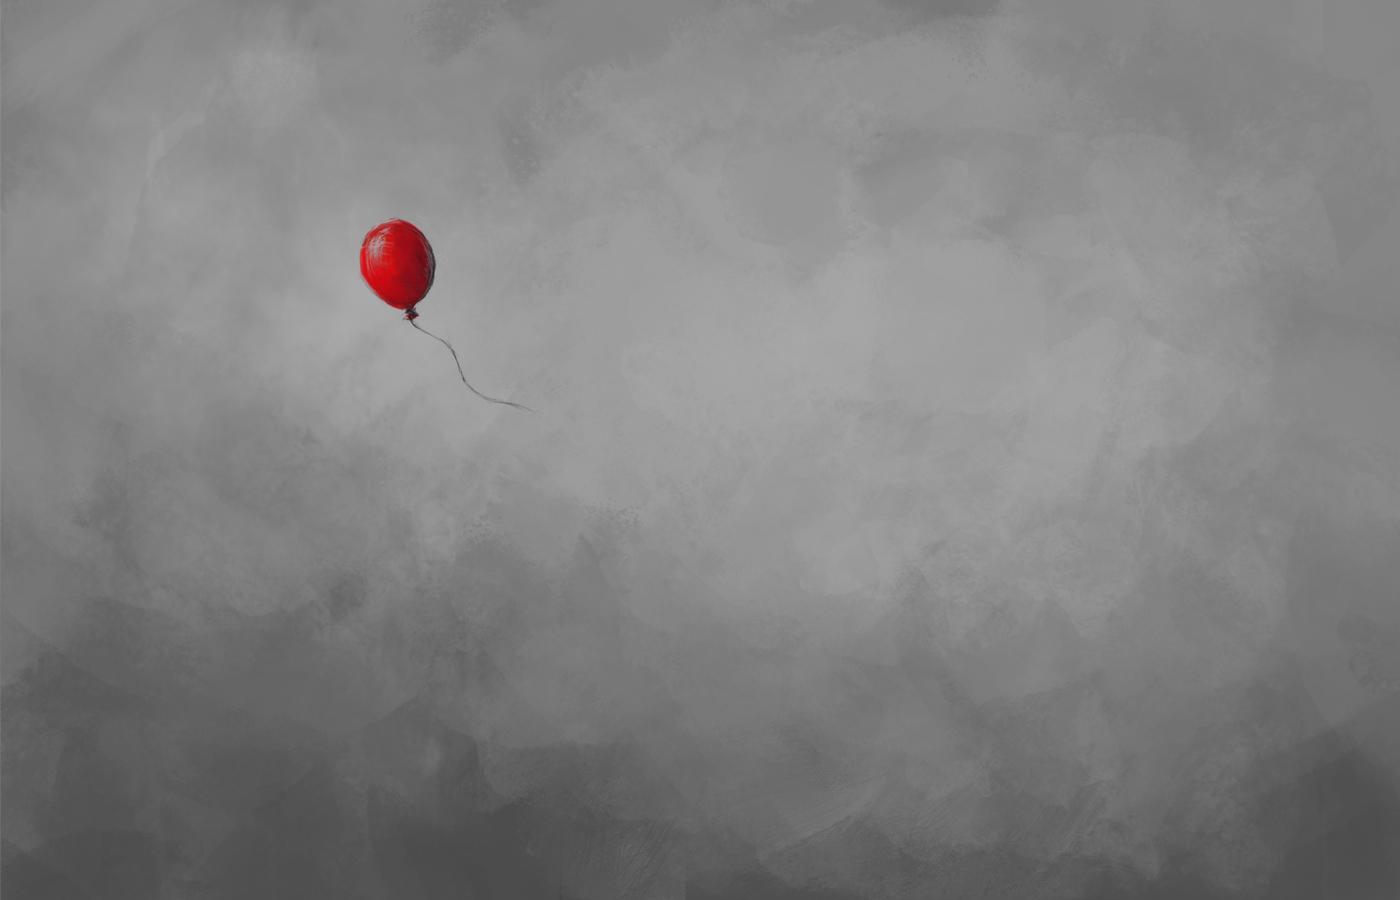 Red balloon wallpaper